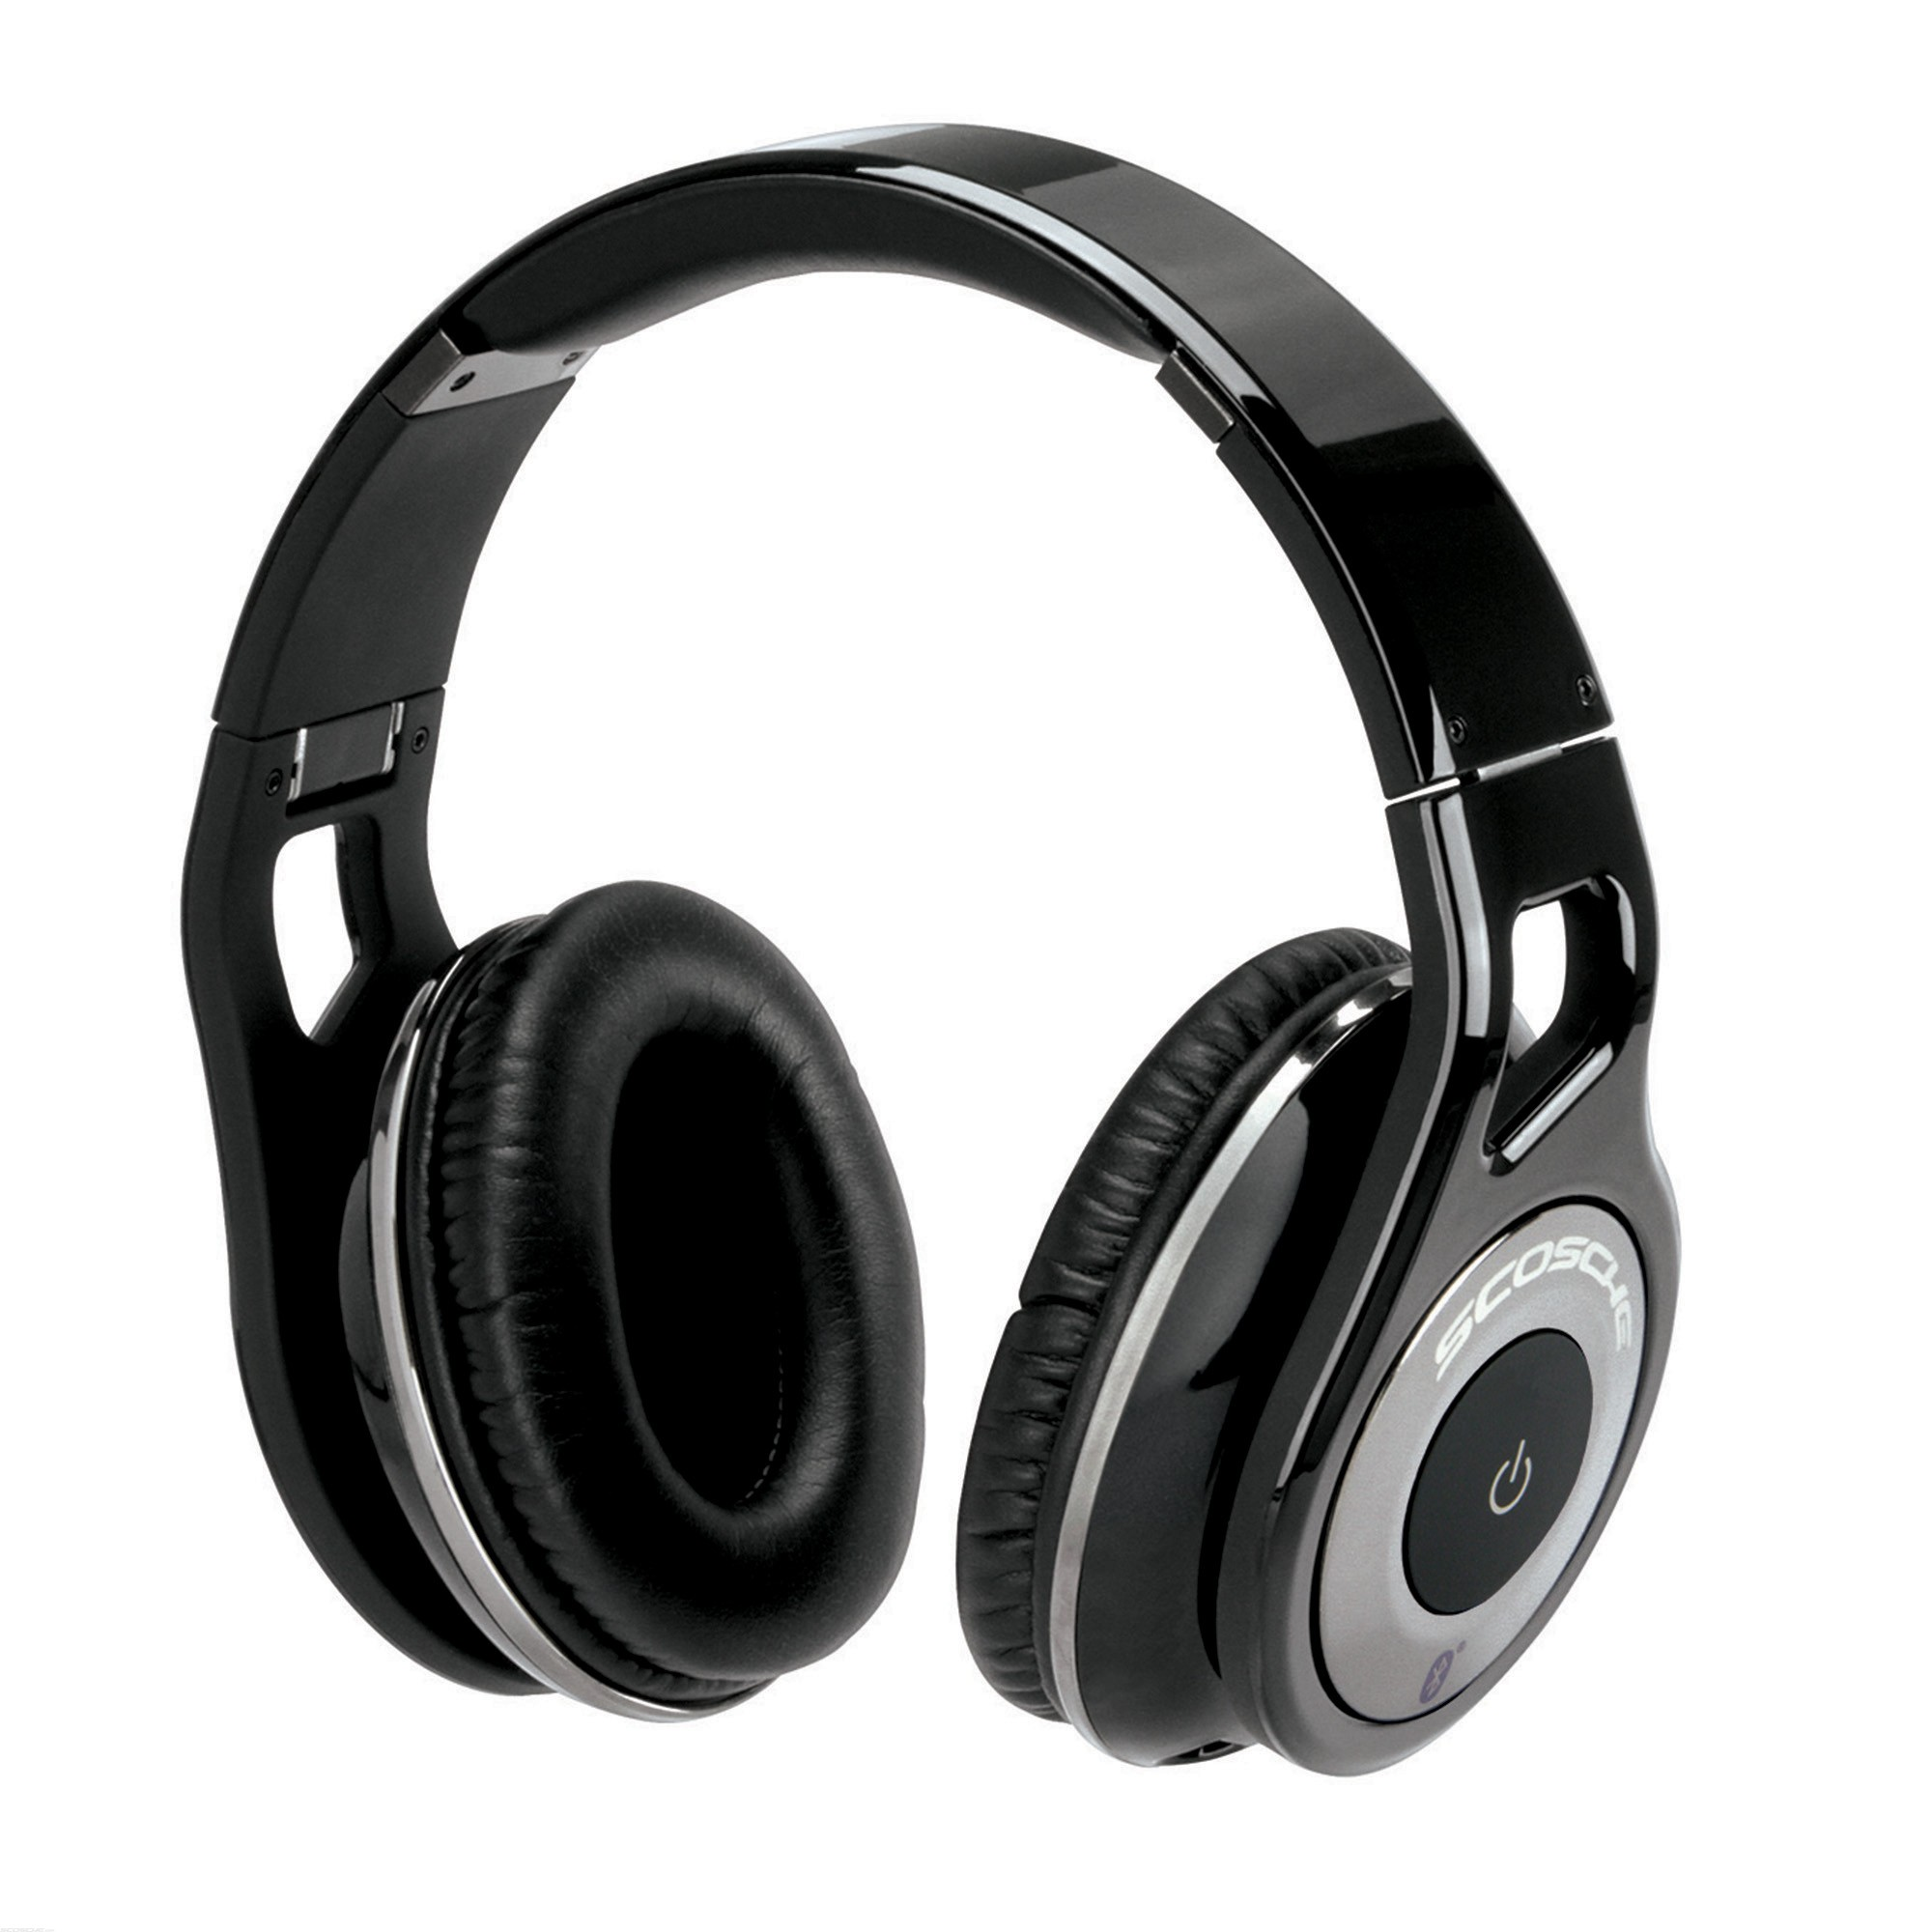 rh1060-wireless-stereo-headphones